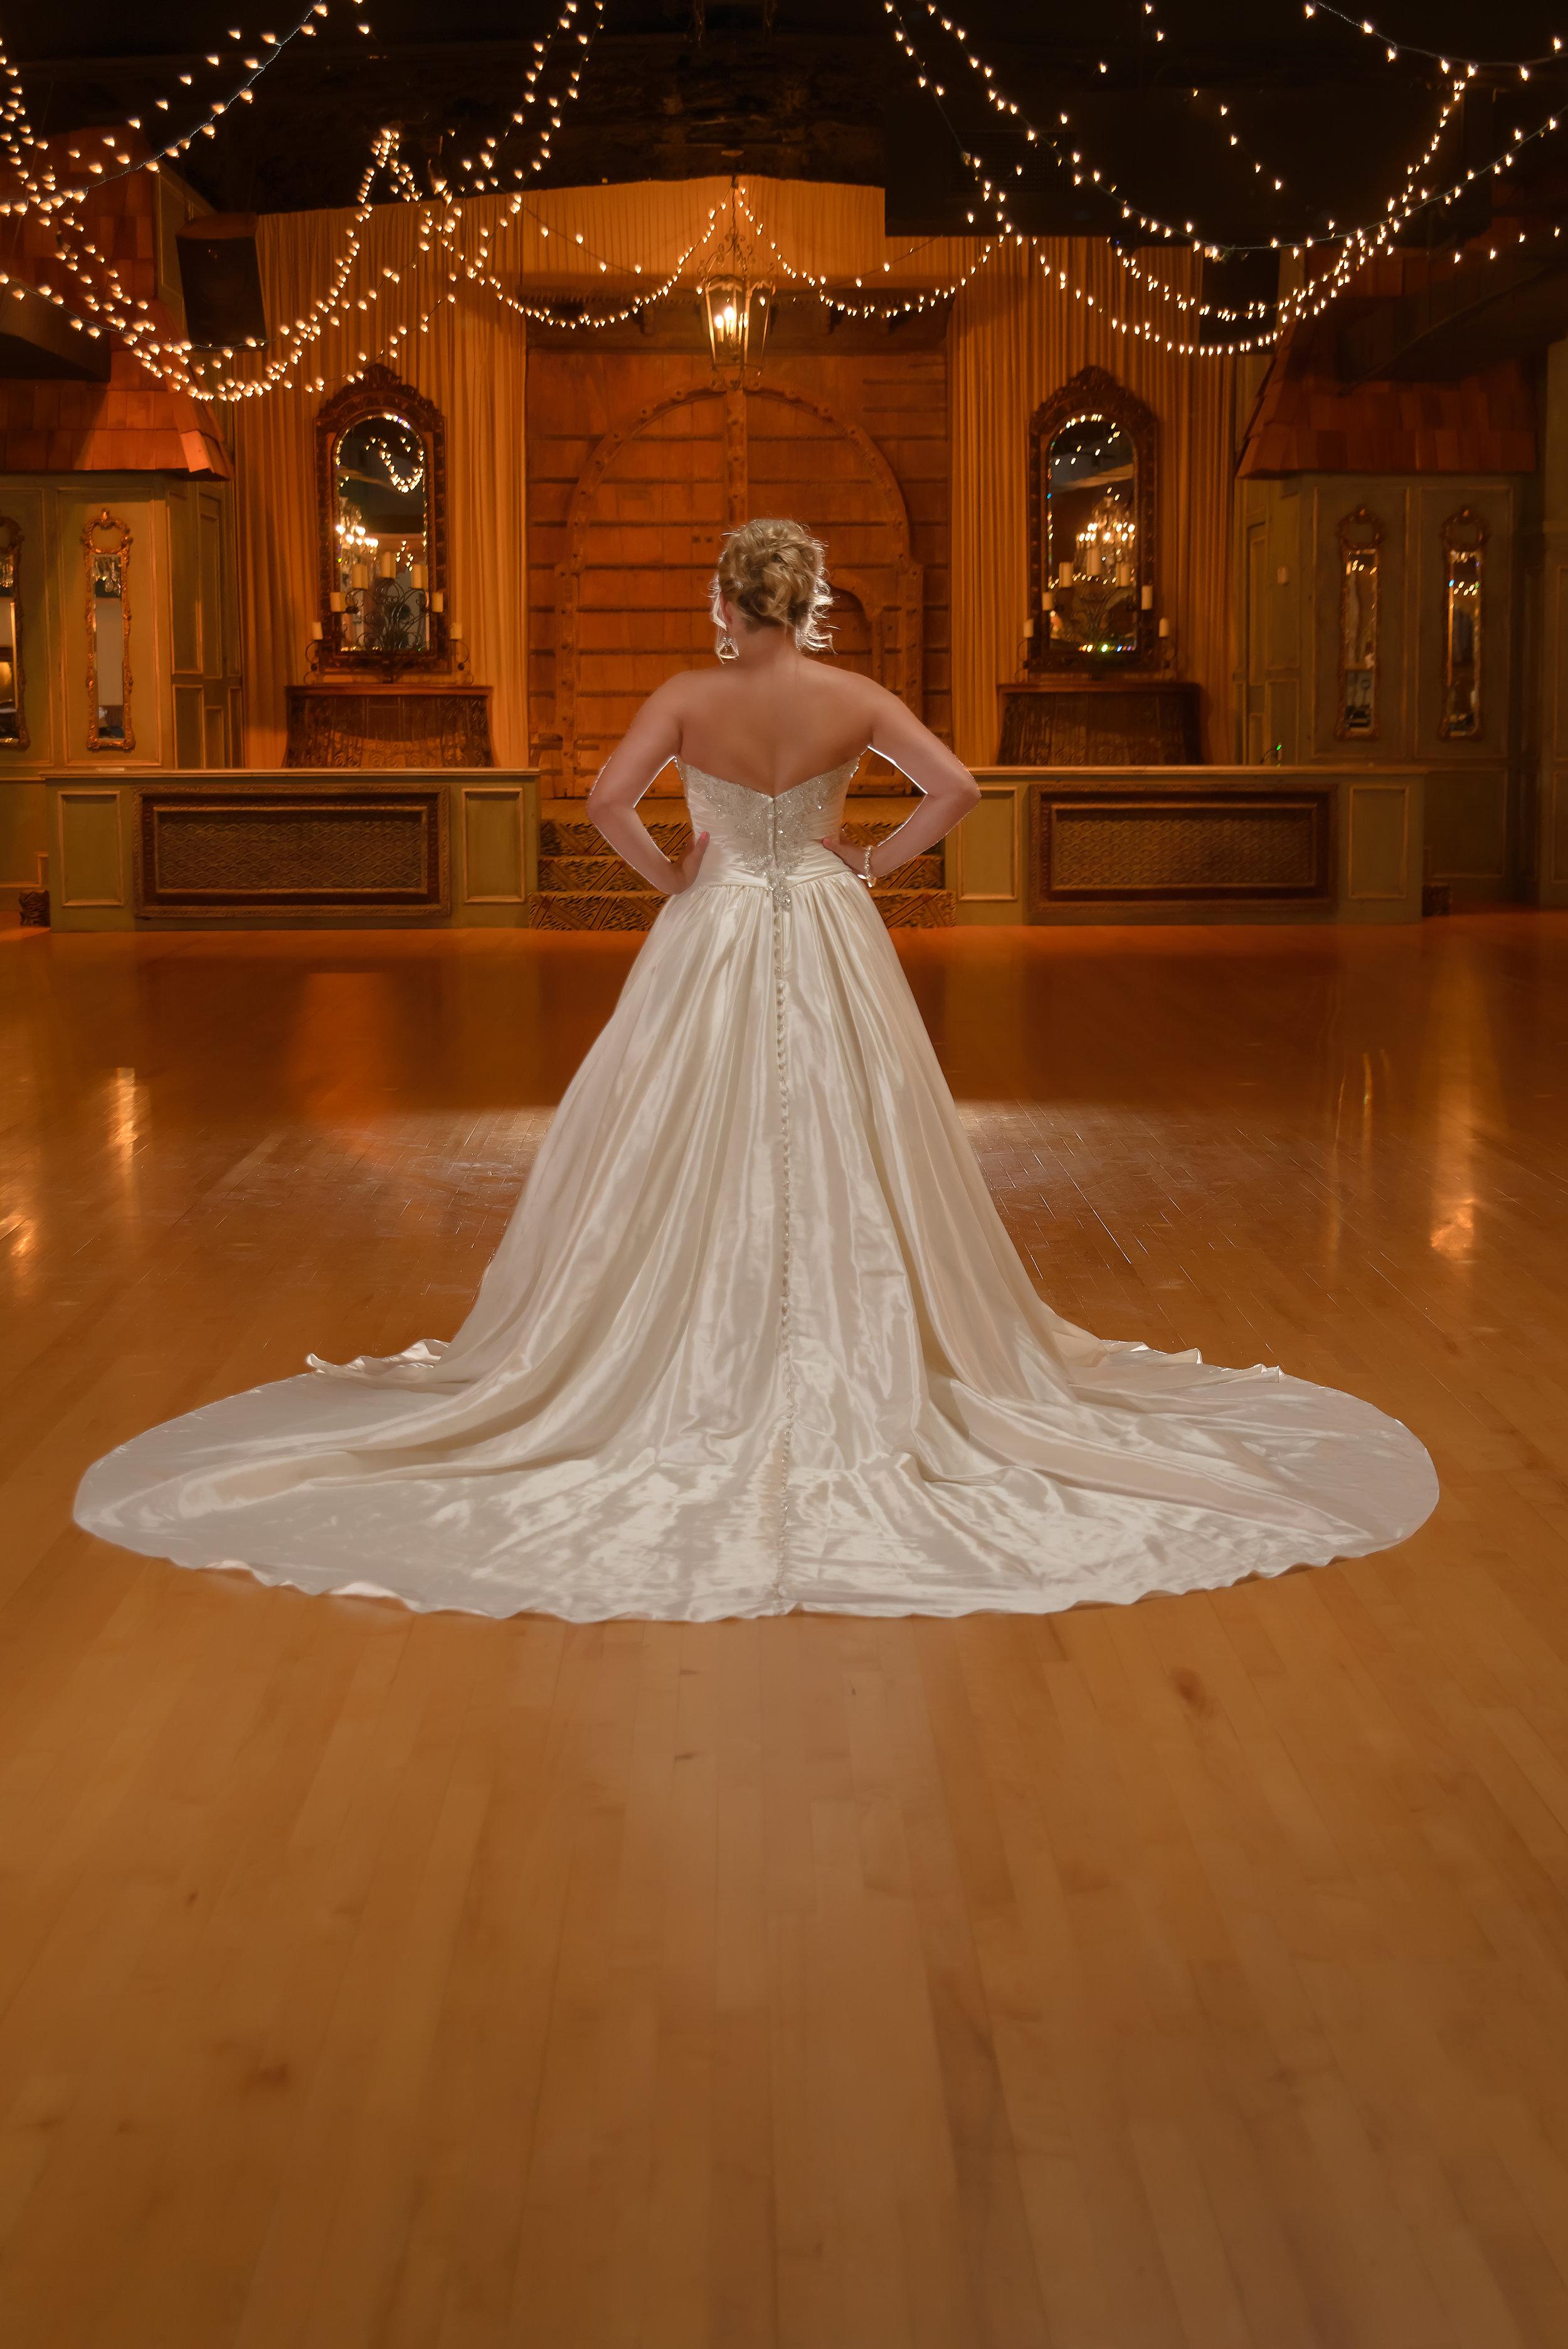 Bridal Pictures OKC photographer The Palace Event Center